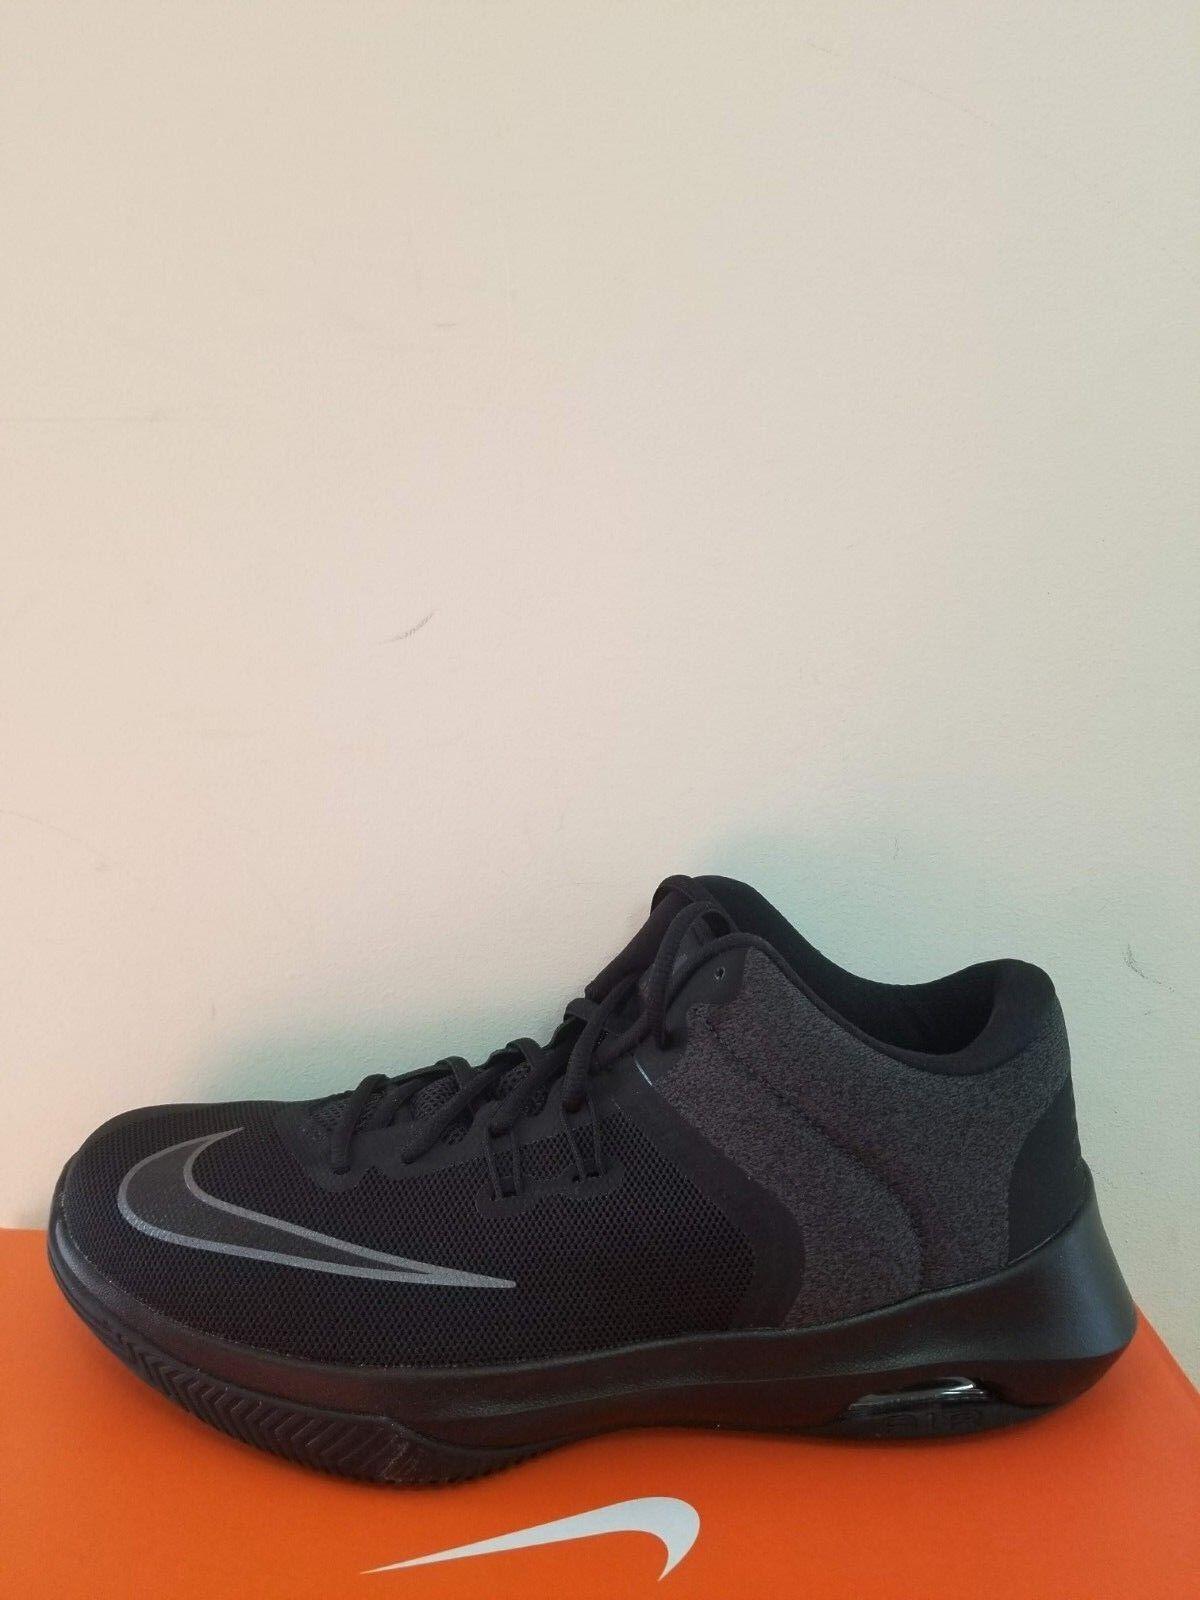 Nike Men's Air Versitile II NBK Basketball shoes Size 10 NIB